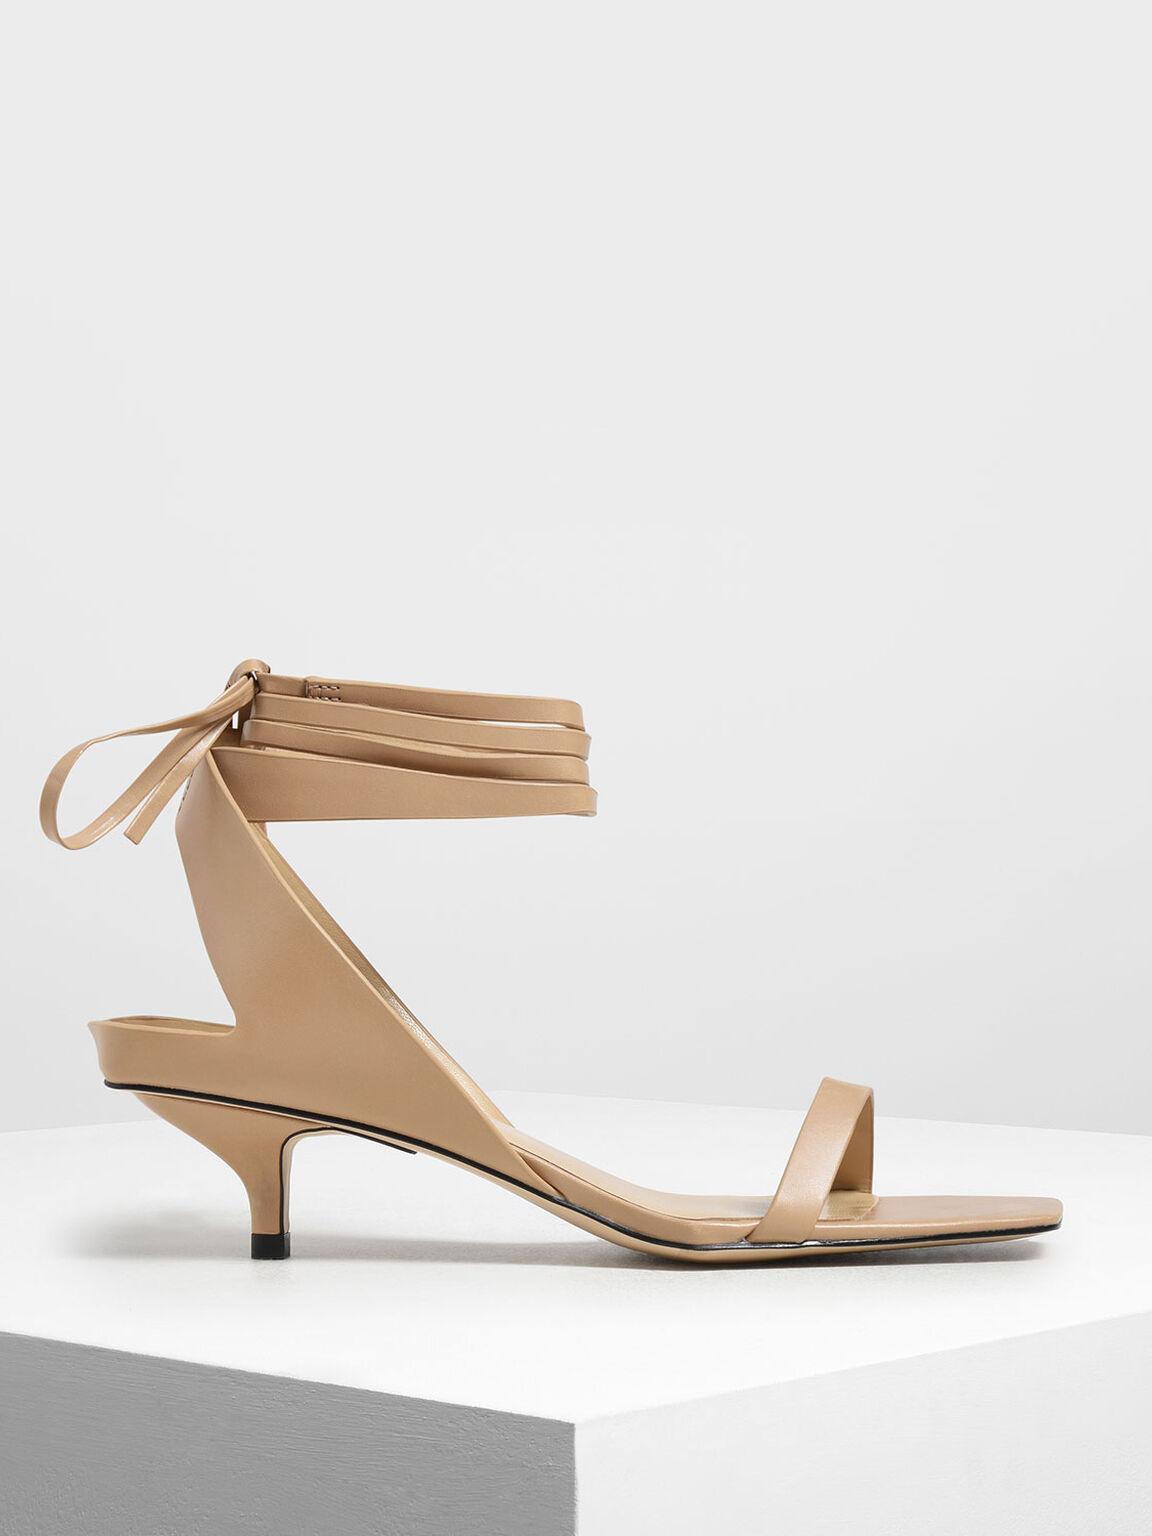 Ankle Tie Square Toe Sandals, Nude, hi-res